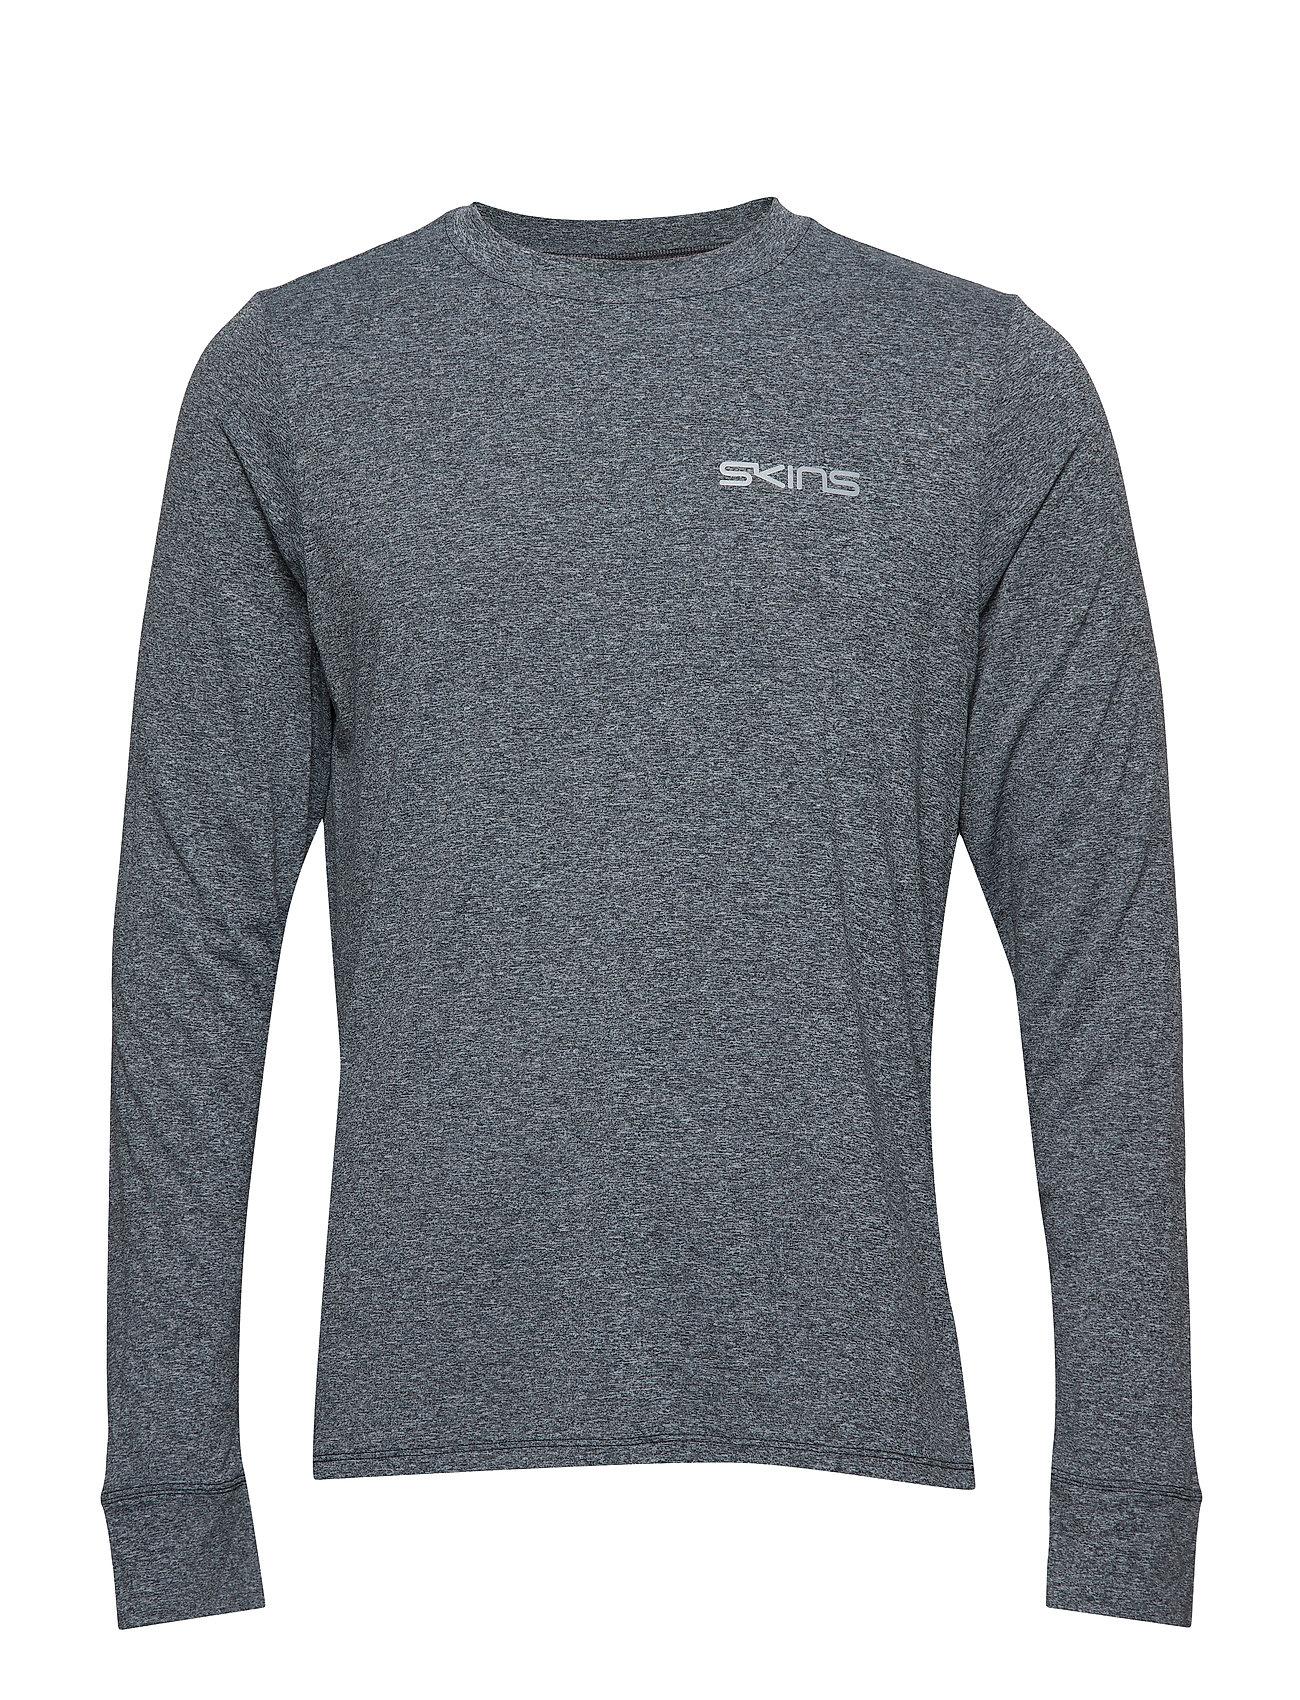 Skins Activewear Bergmar Mens Active Top L S Round Neck Ögrönlar